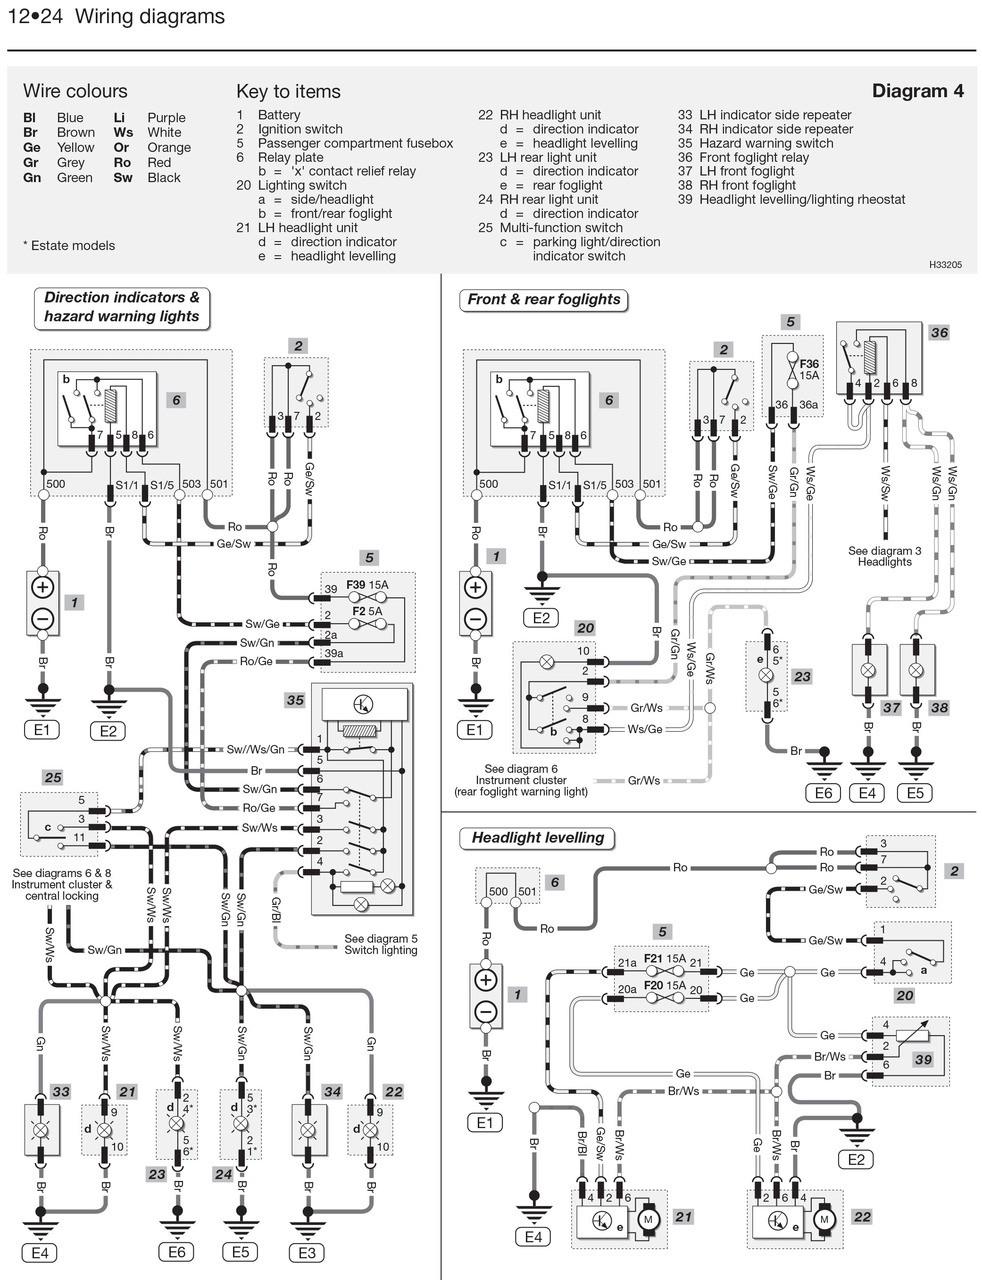 workshop manual passat avf daily instruction manual guides u2022 rh testingwordpress co VW Transporter Manual VW Passat Manual